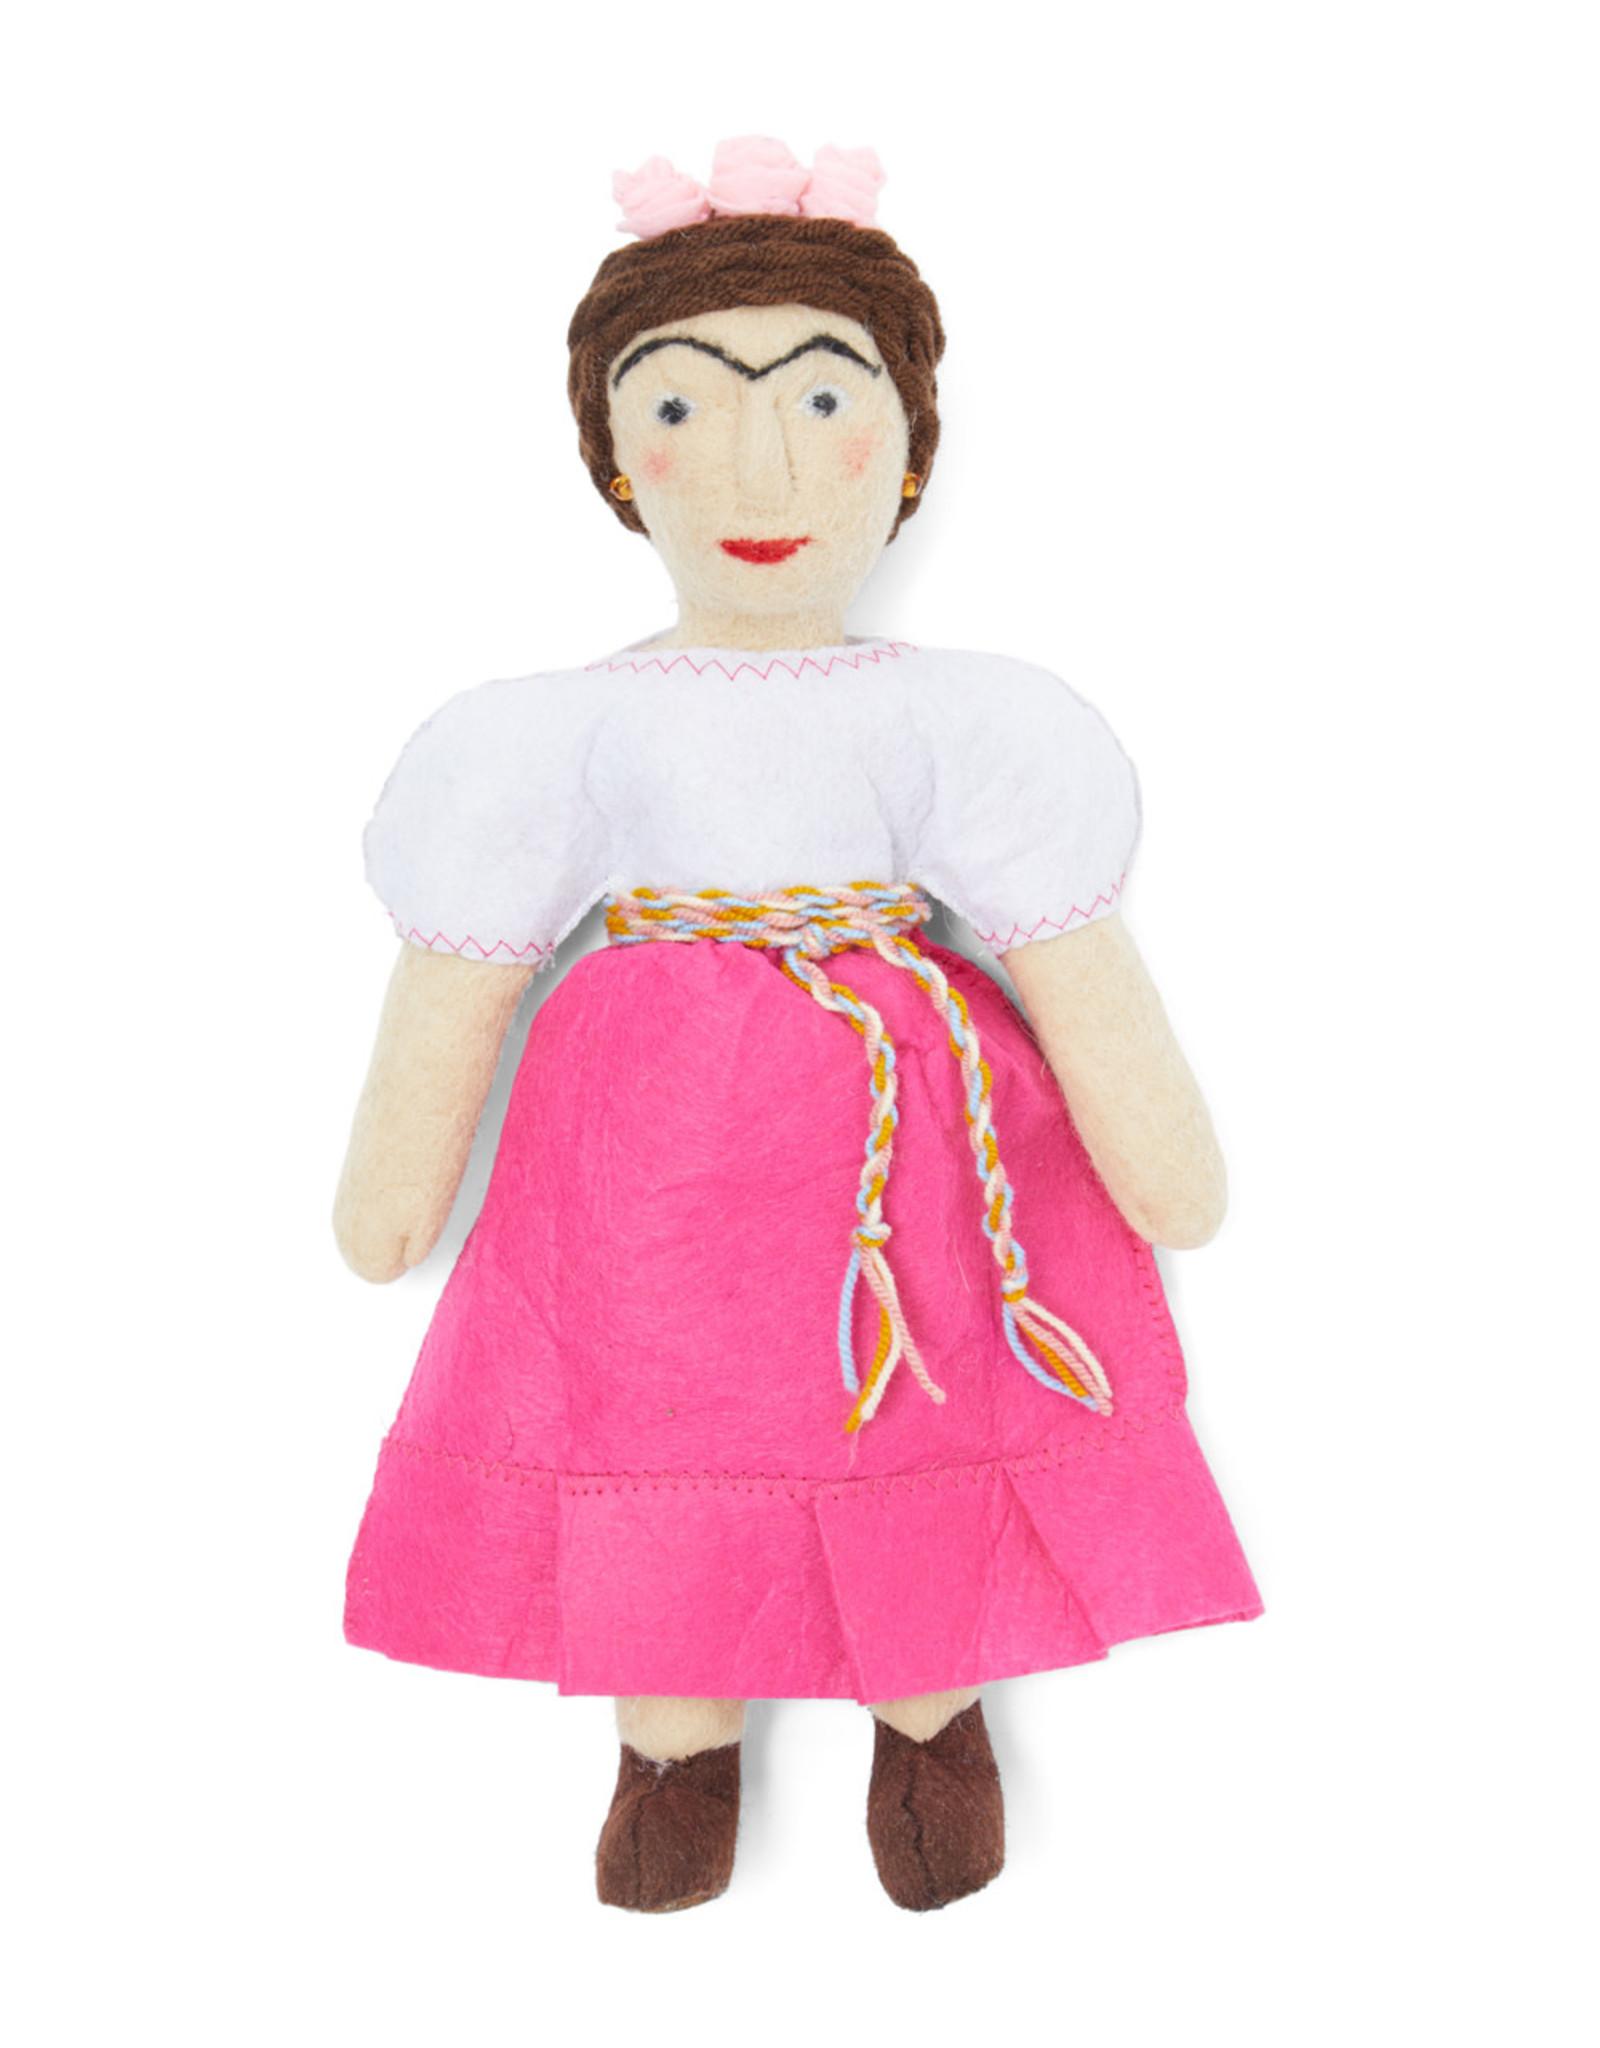 Kyrgyzstan, Historical Felt Dolls Frida Kahlo